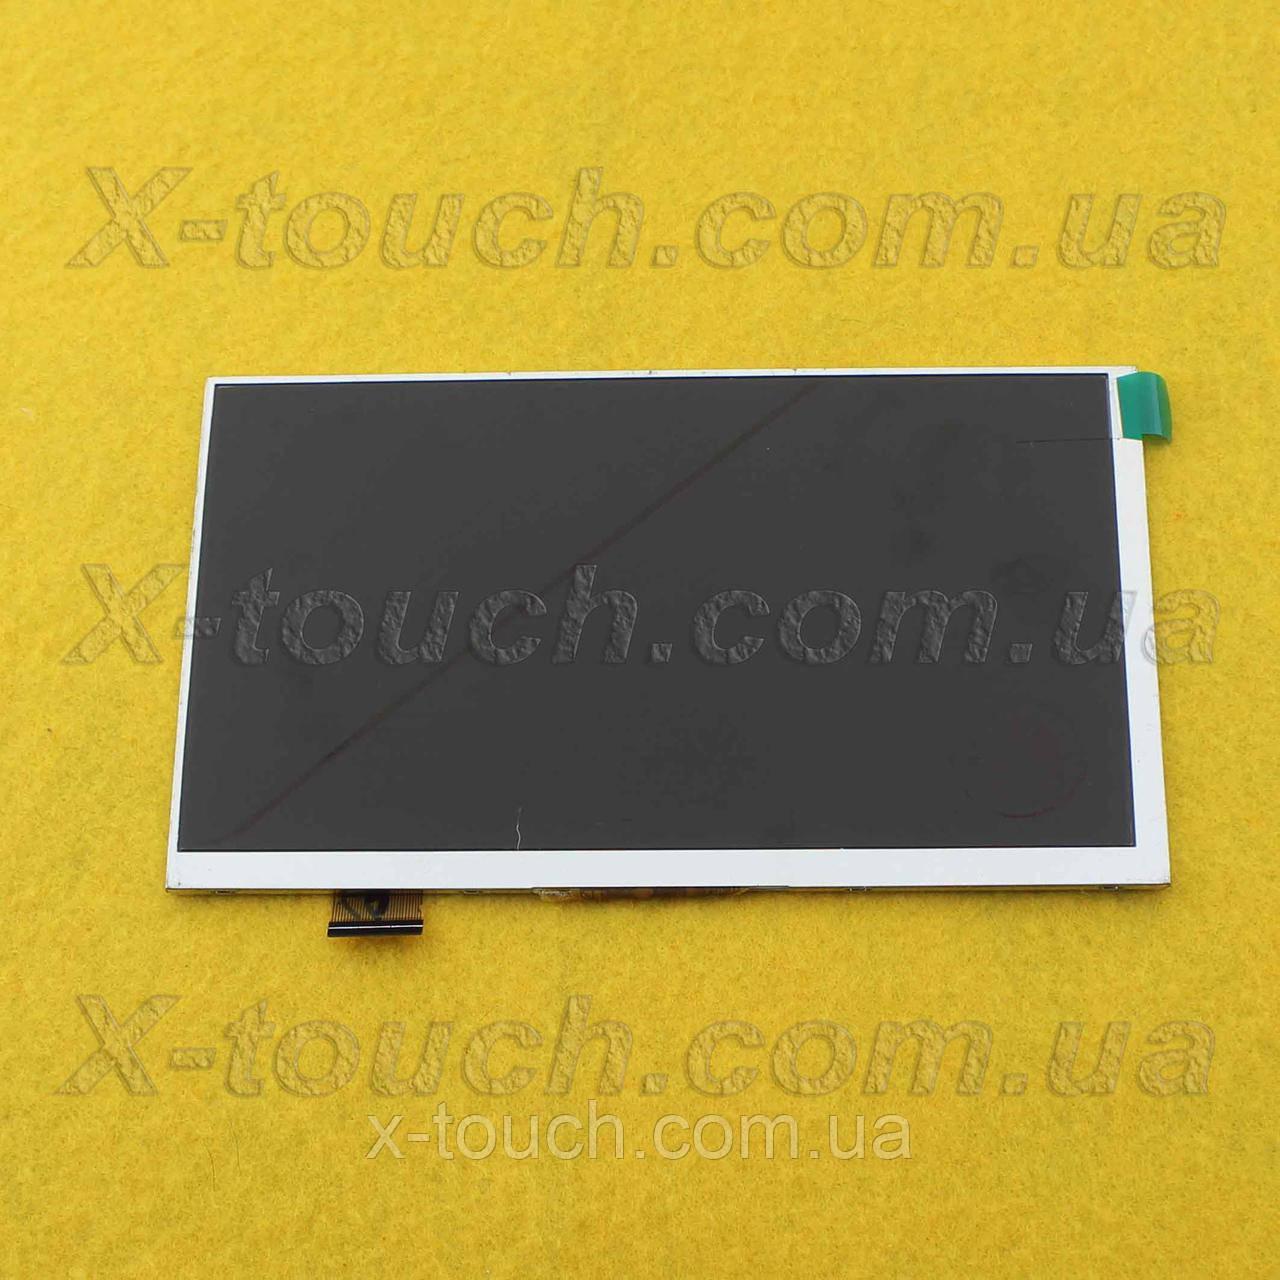 Матриця,екран, дисплей Digma Optima 7.08 3G для планшета